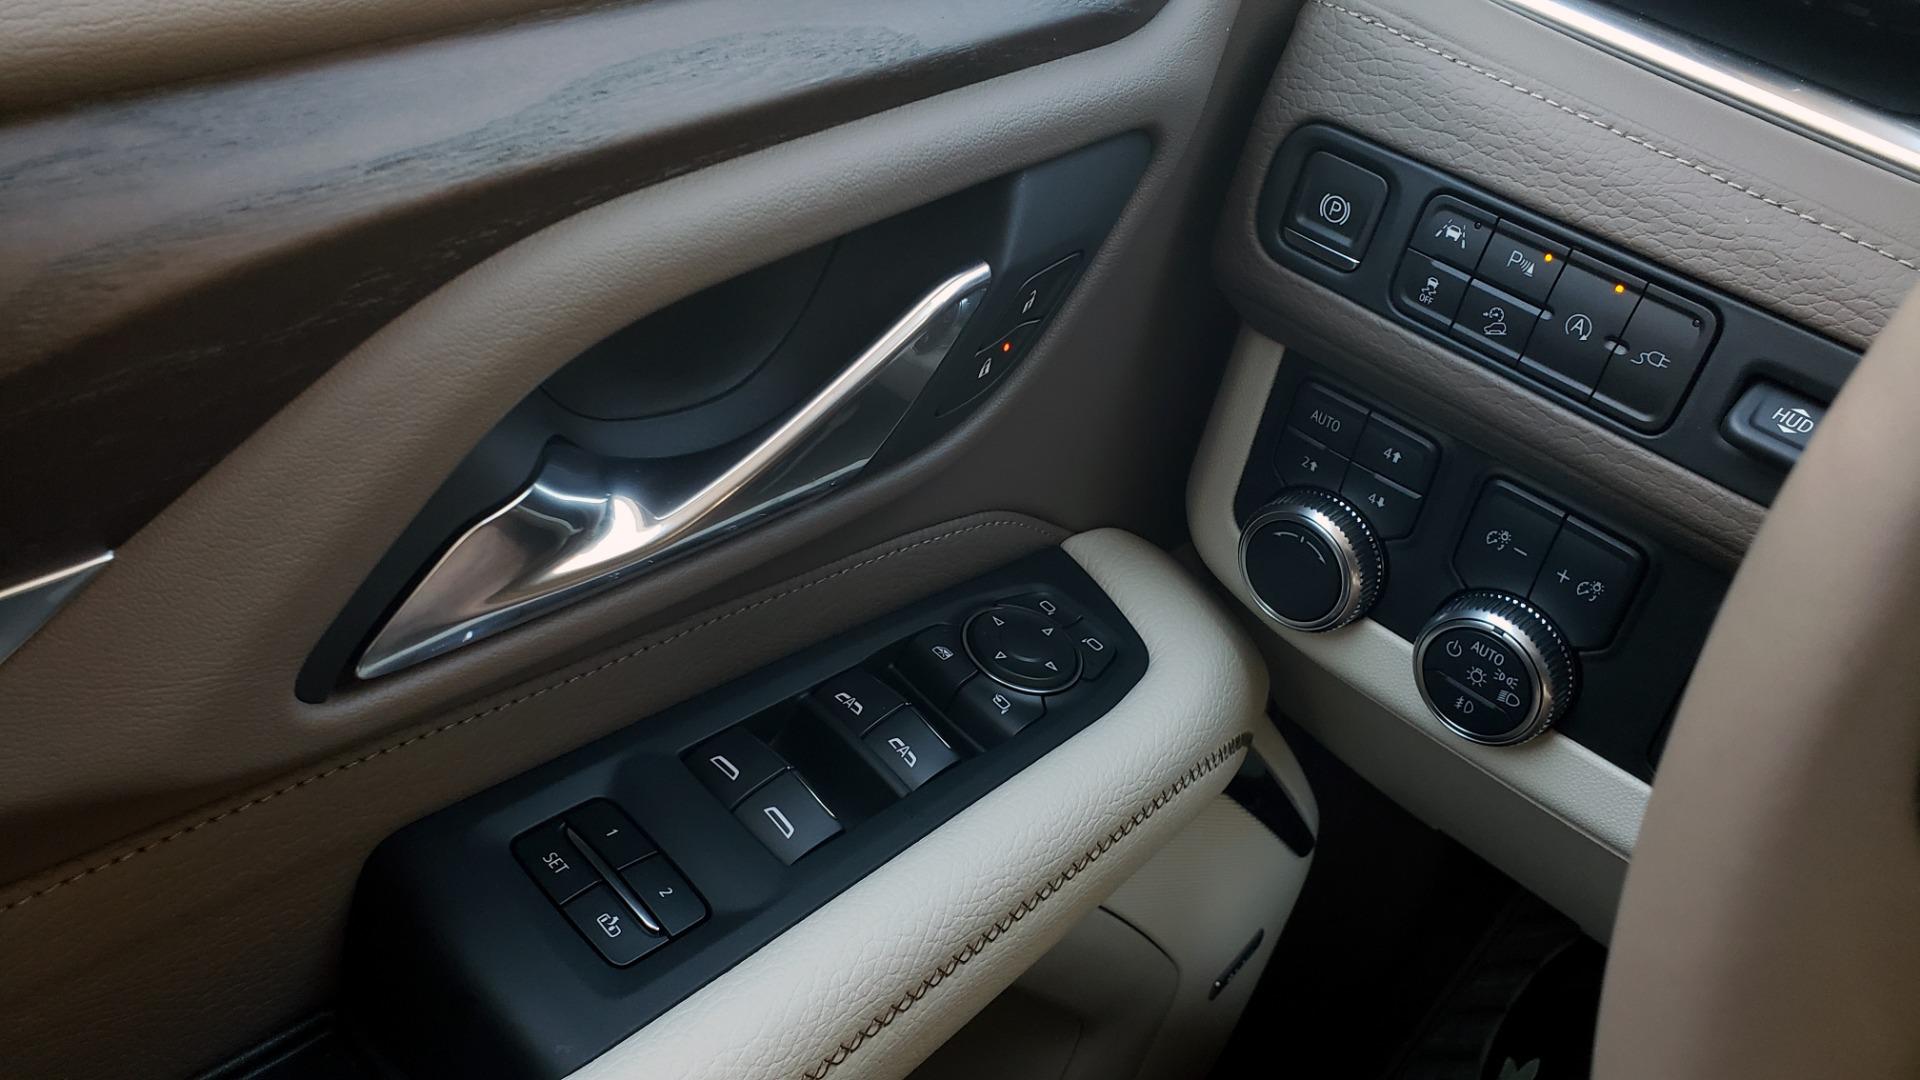 Used 2021 GMC YUKON DENALI PREMIUM 4WD / NAV / ADVANCED TECH / ENTERTAINMENT for sale Sold at Formula Imports in Charlotte NC 28227 43